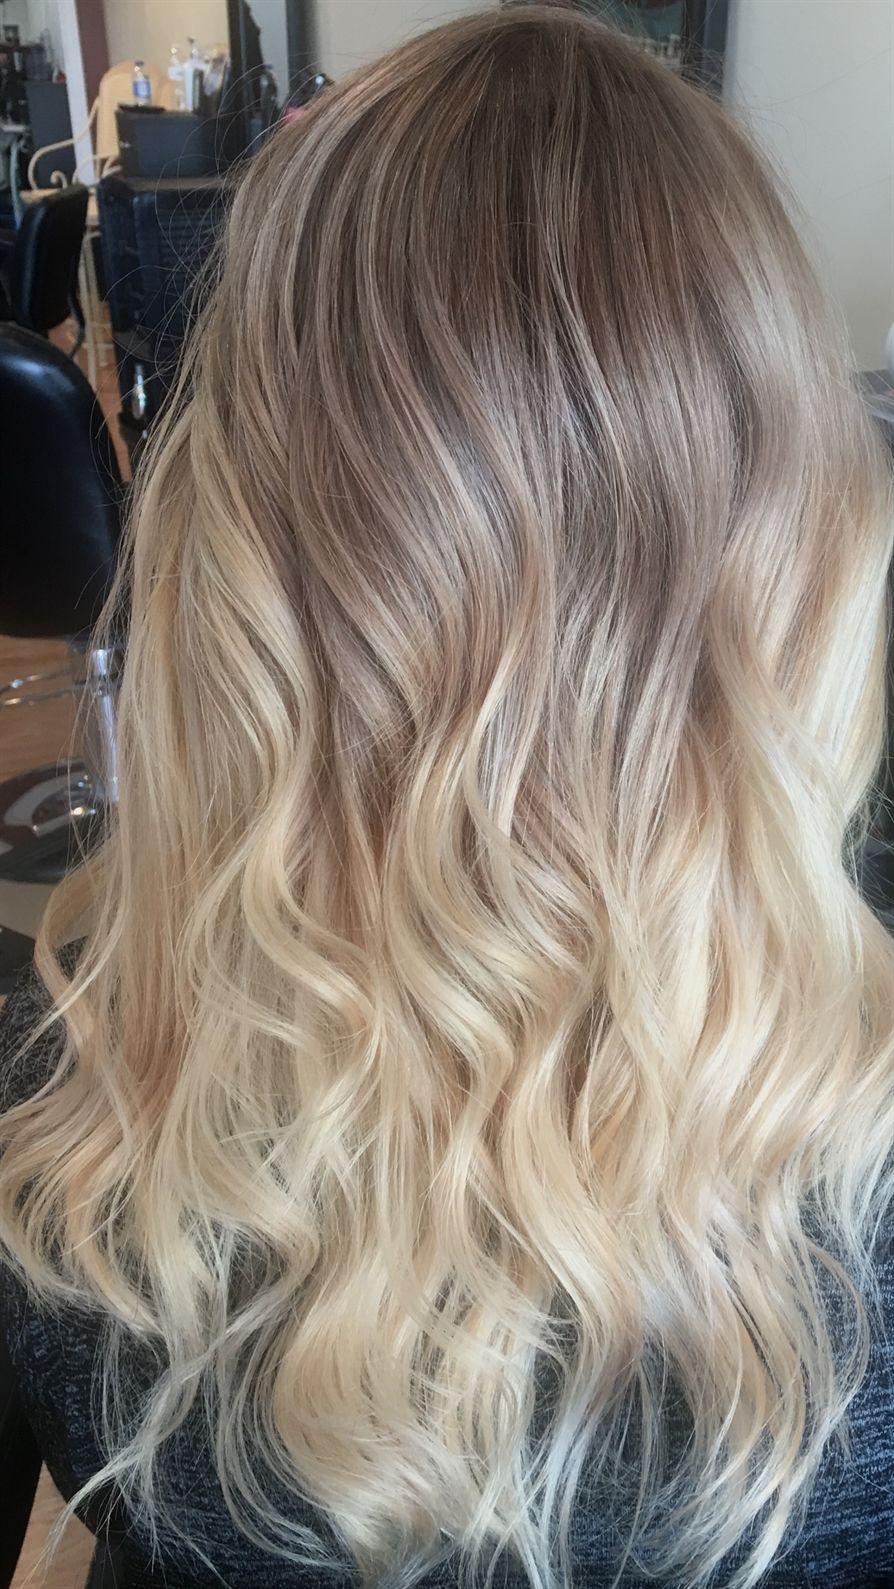 Ashy Blonde Ombré Balayage Blondeombre Hair In 2019 Włosy